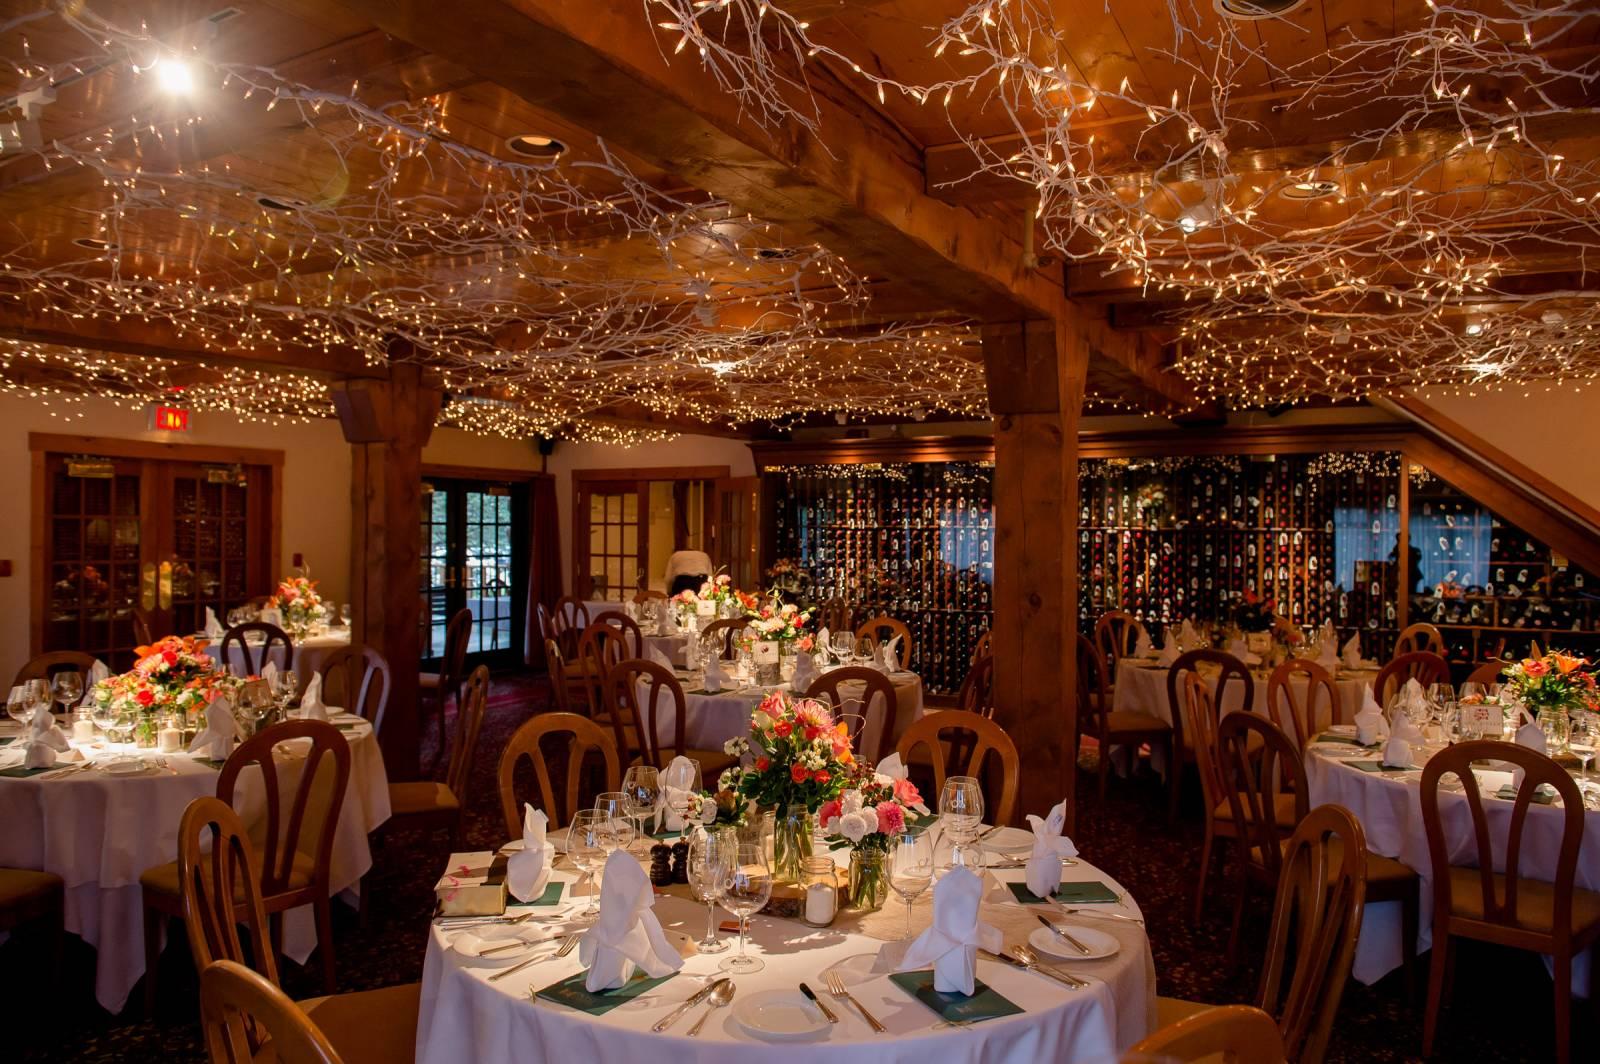 The Post Hotel Lake Louise Wedding Venue